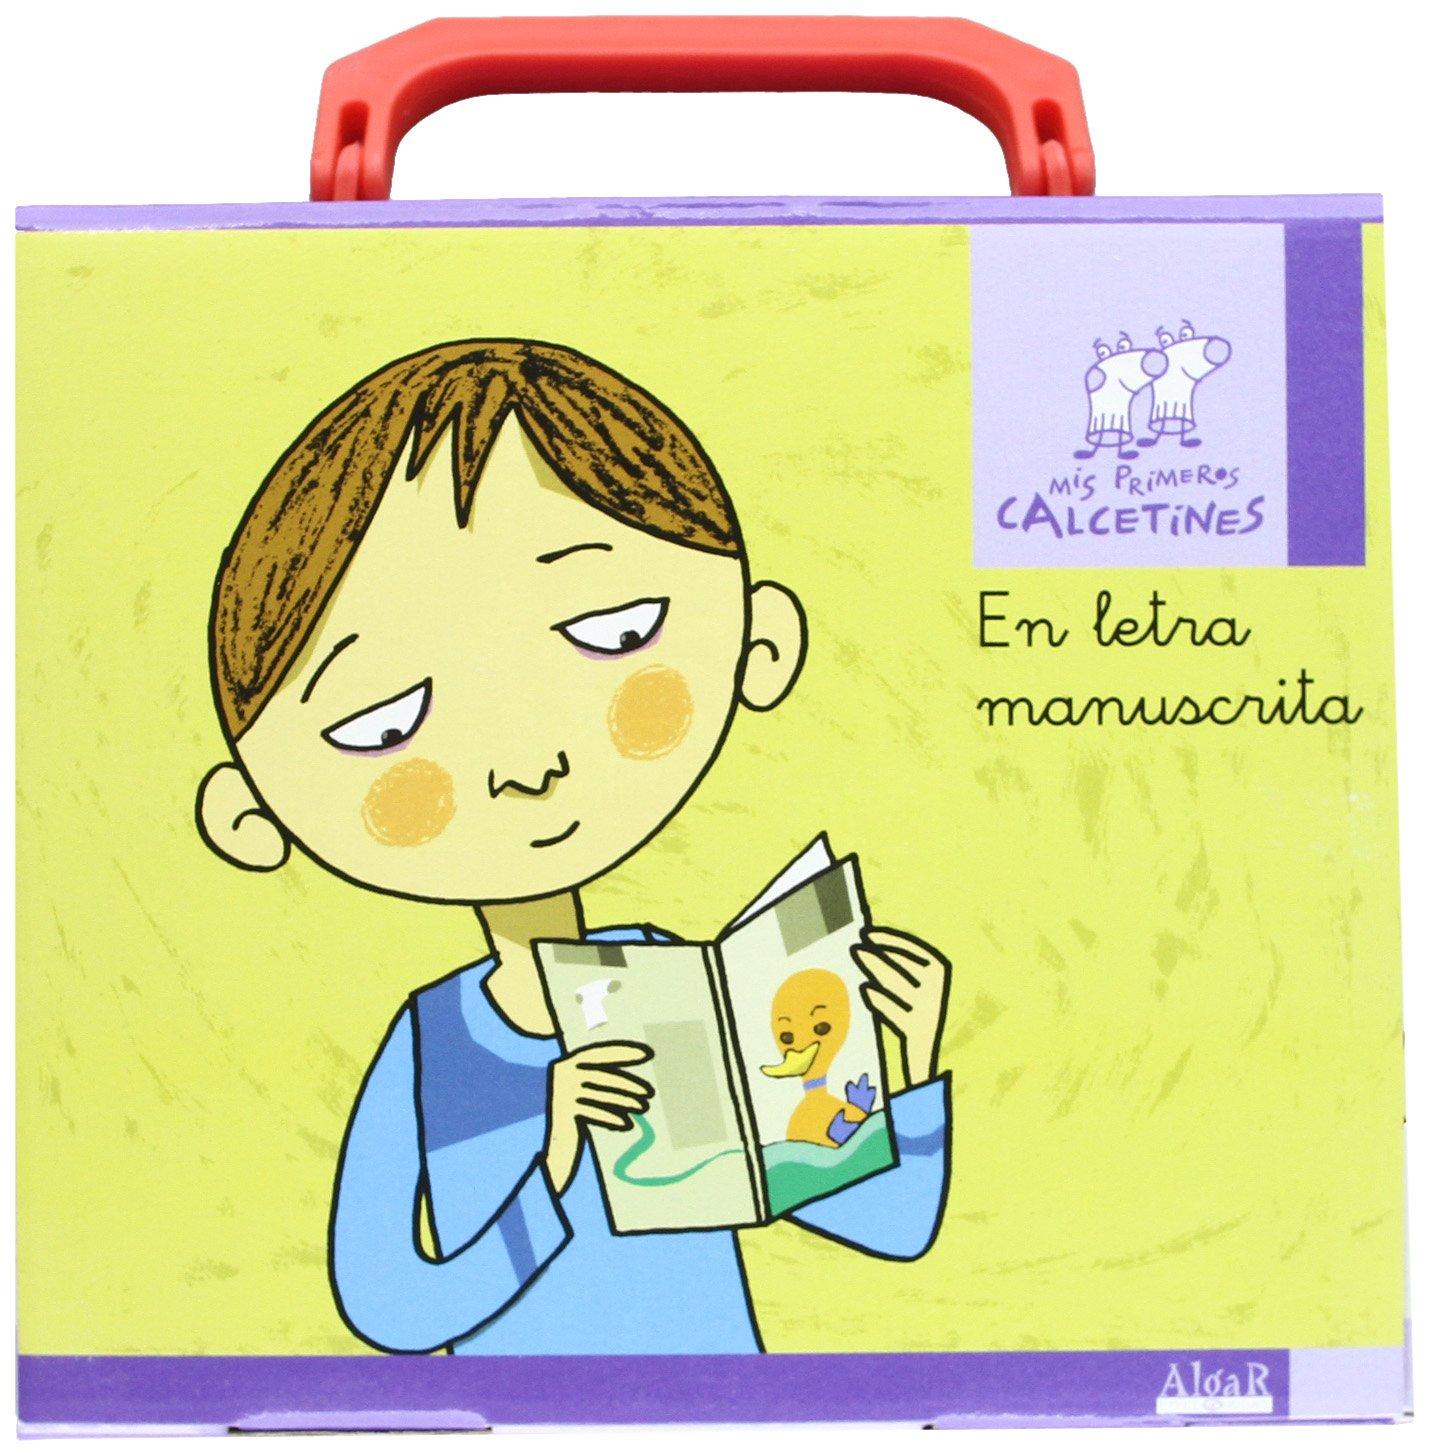 Maleta: Mis Primeros Calcetines - Manuscrita - 9788496514560: Amazon.es:  Teresa Soler Cobo, Armand González Cardona: Libros